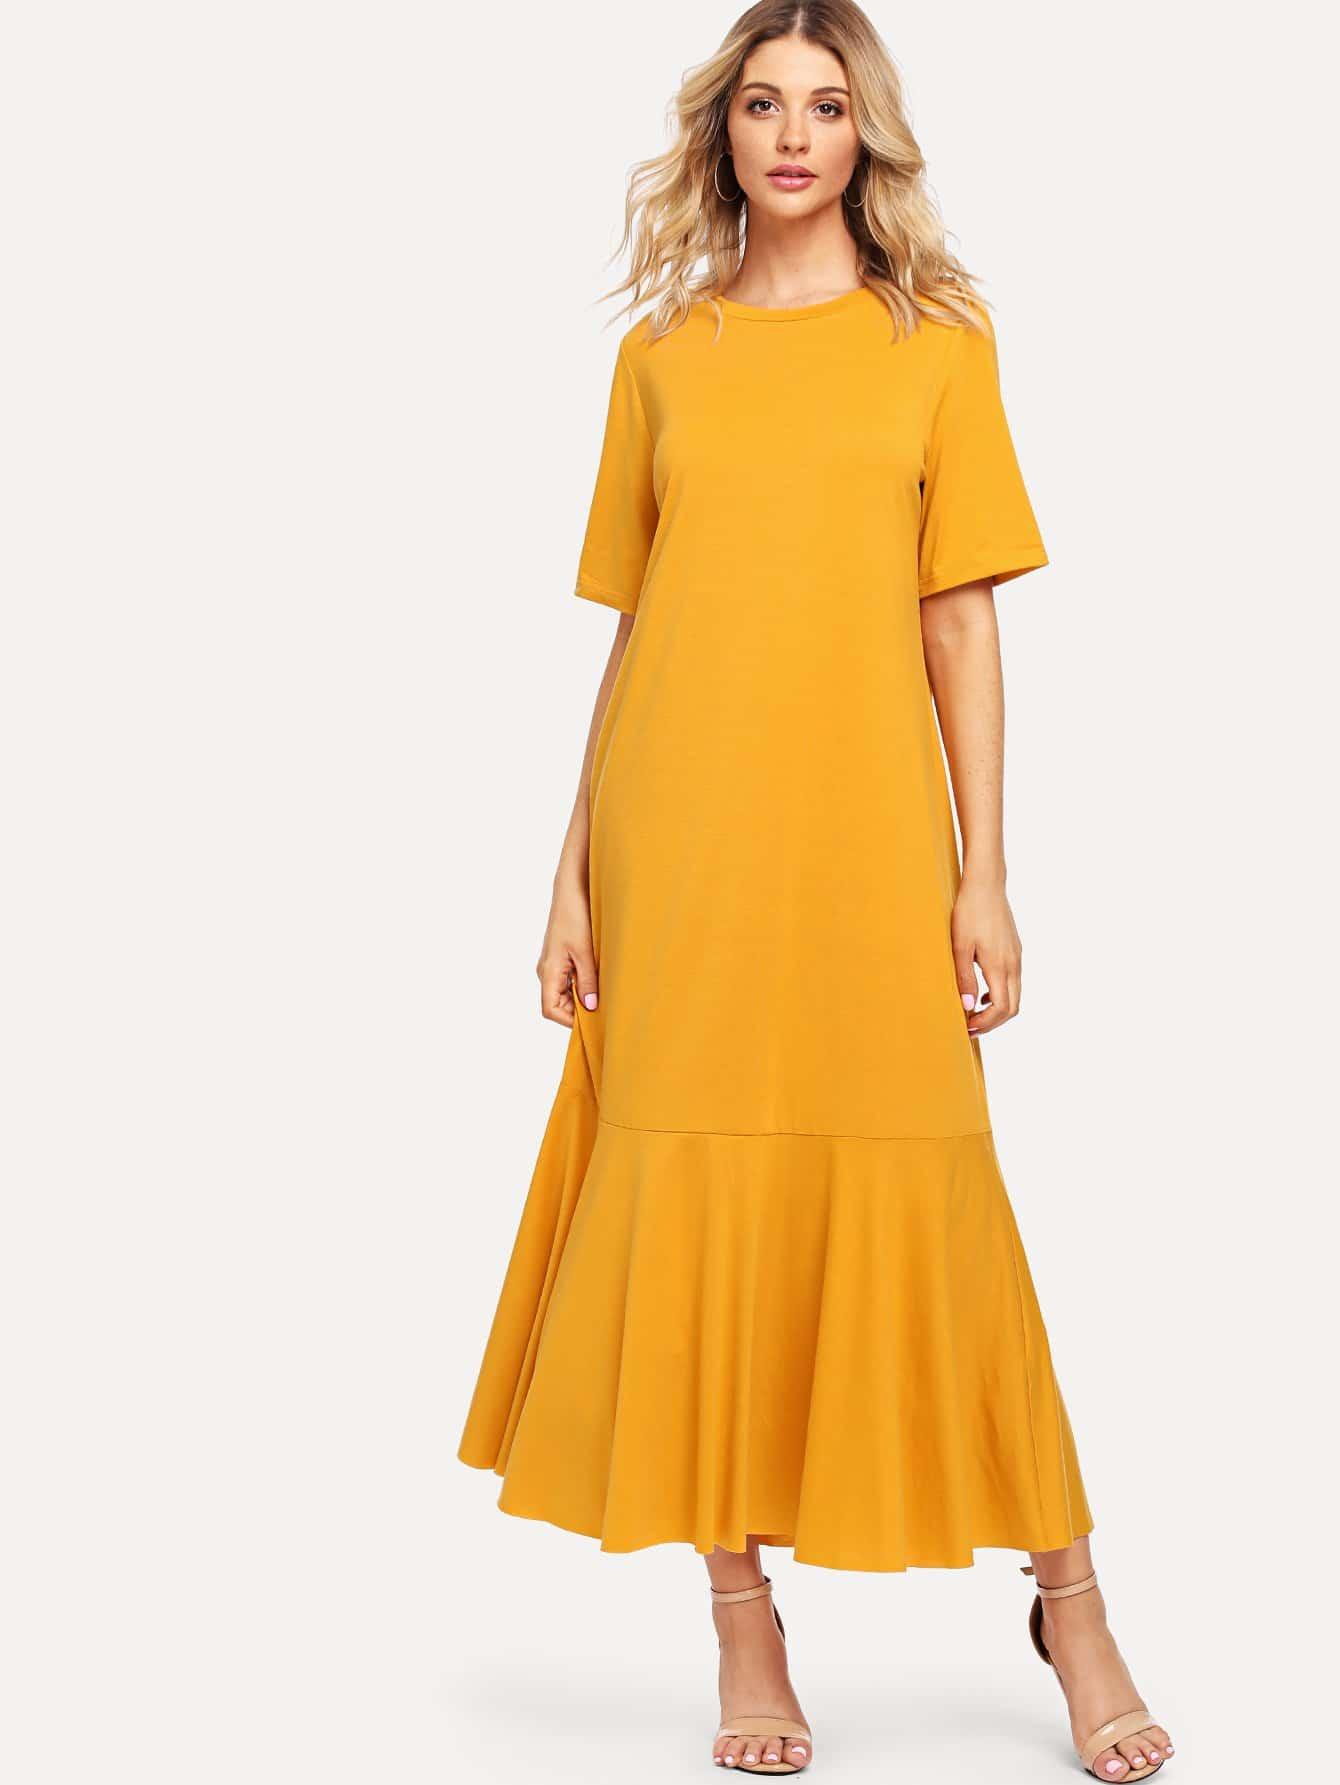 Solid Ruffle Hem Dress tied neck solid ruffle hem dress